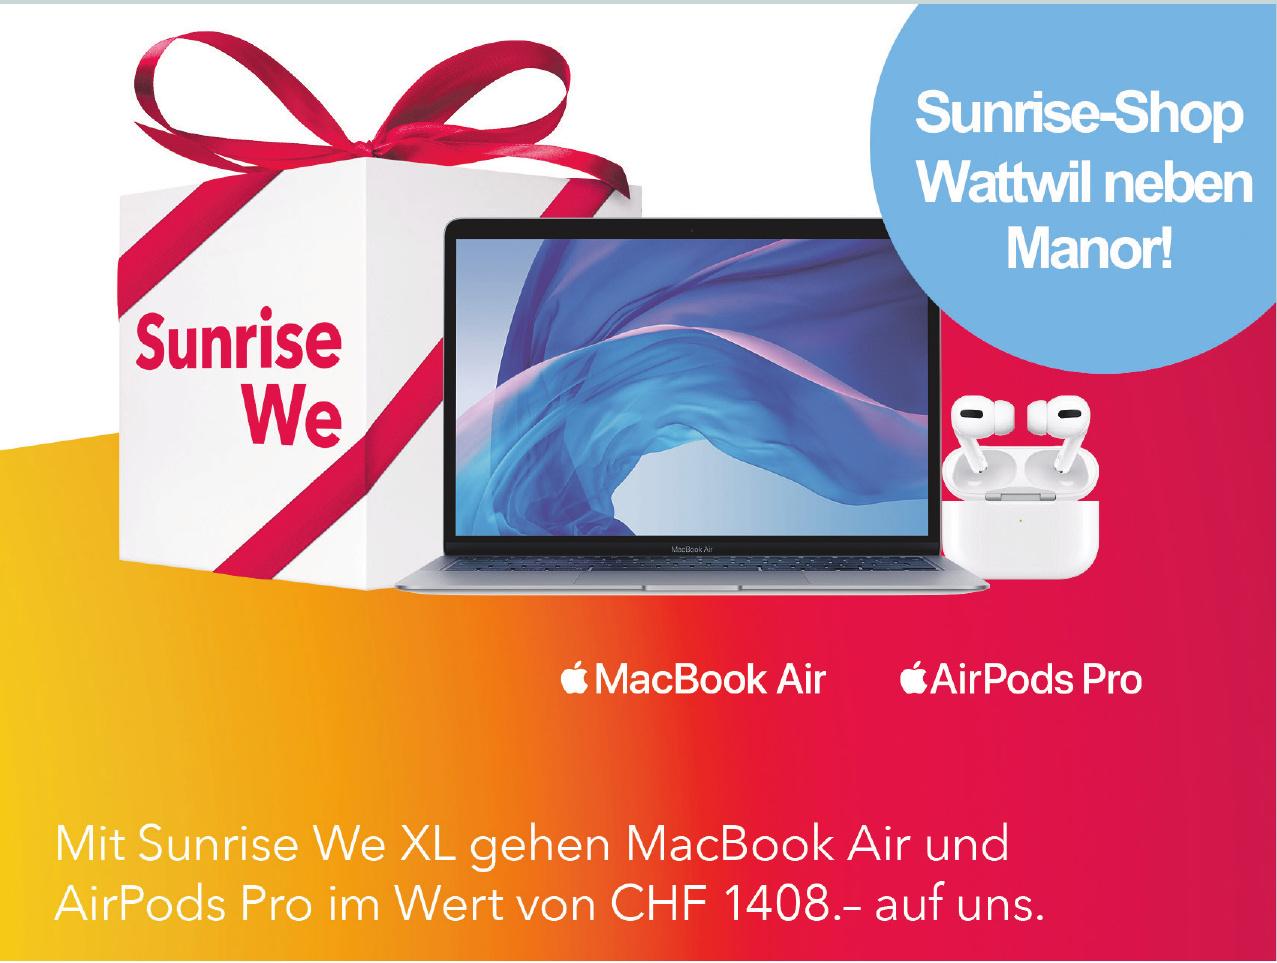 Sunrise-Shop Wattwil